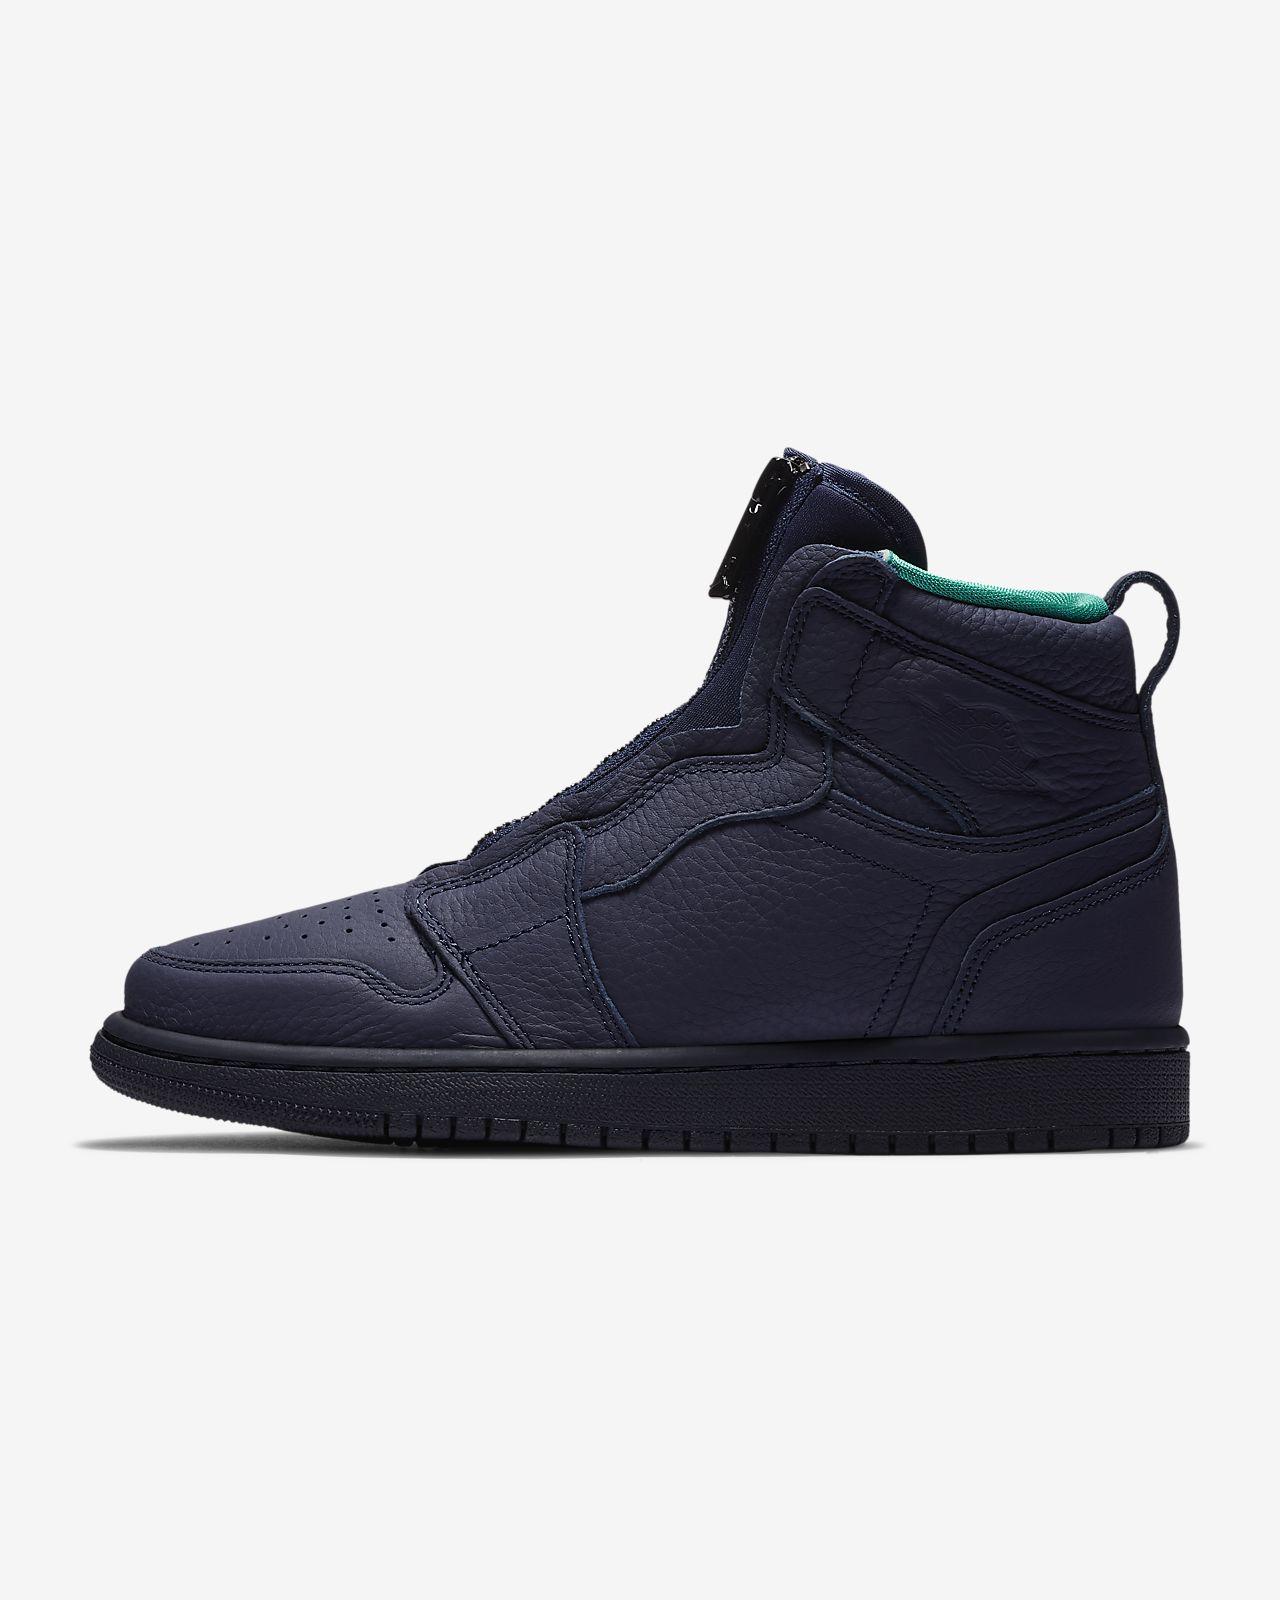 pick up special section discount shop Chaussure Air Jordan 1 High Zip pour Femme